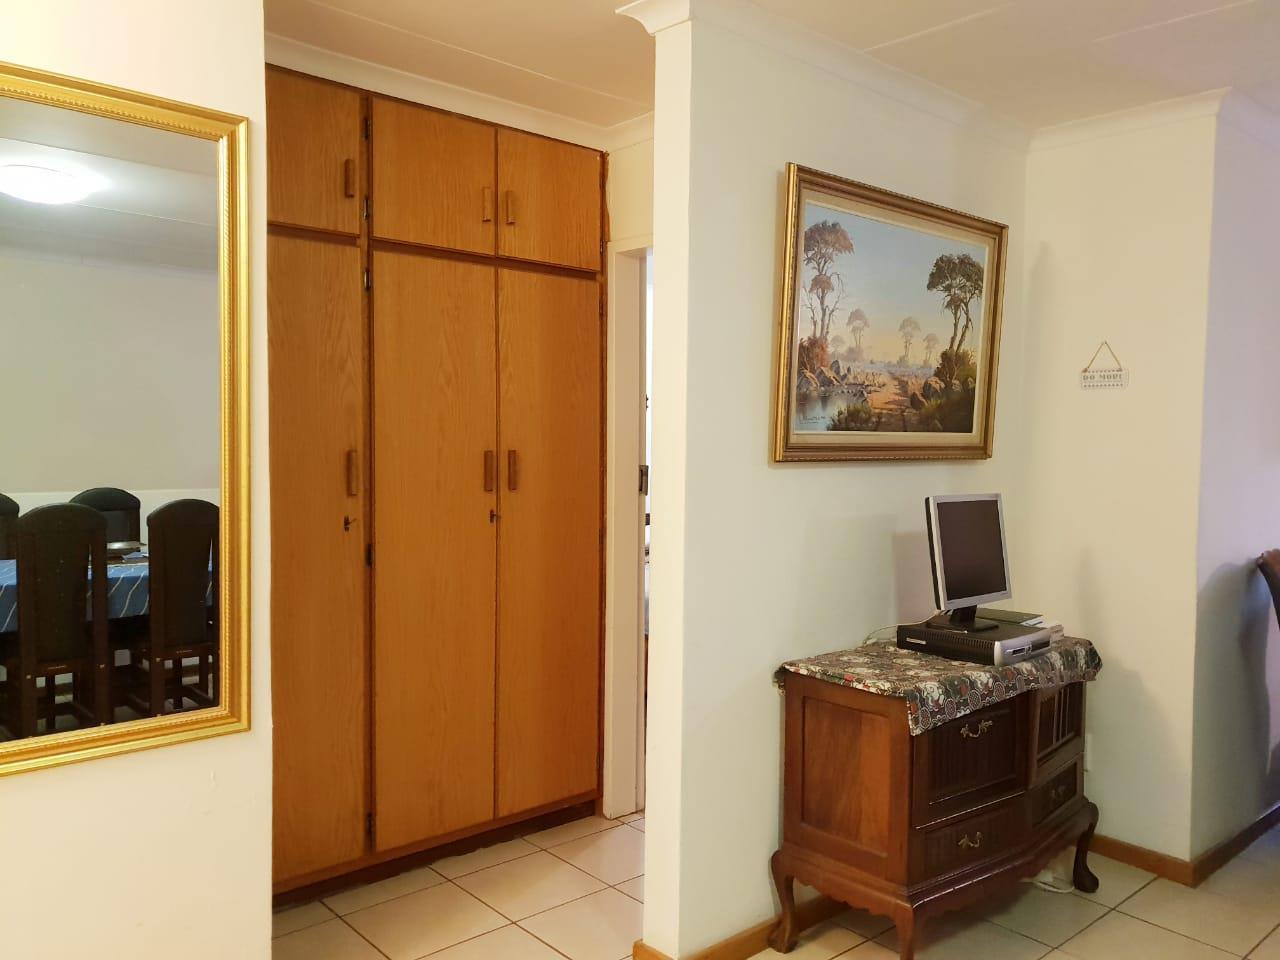 2 Bedroom Townhouse For Sale in Heuwelsig